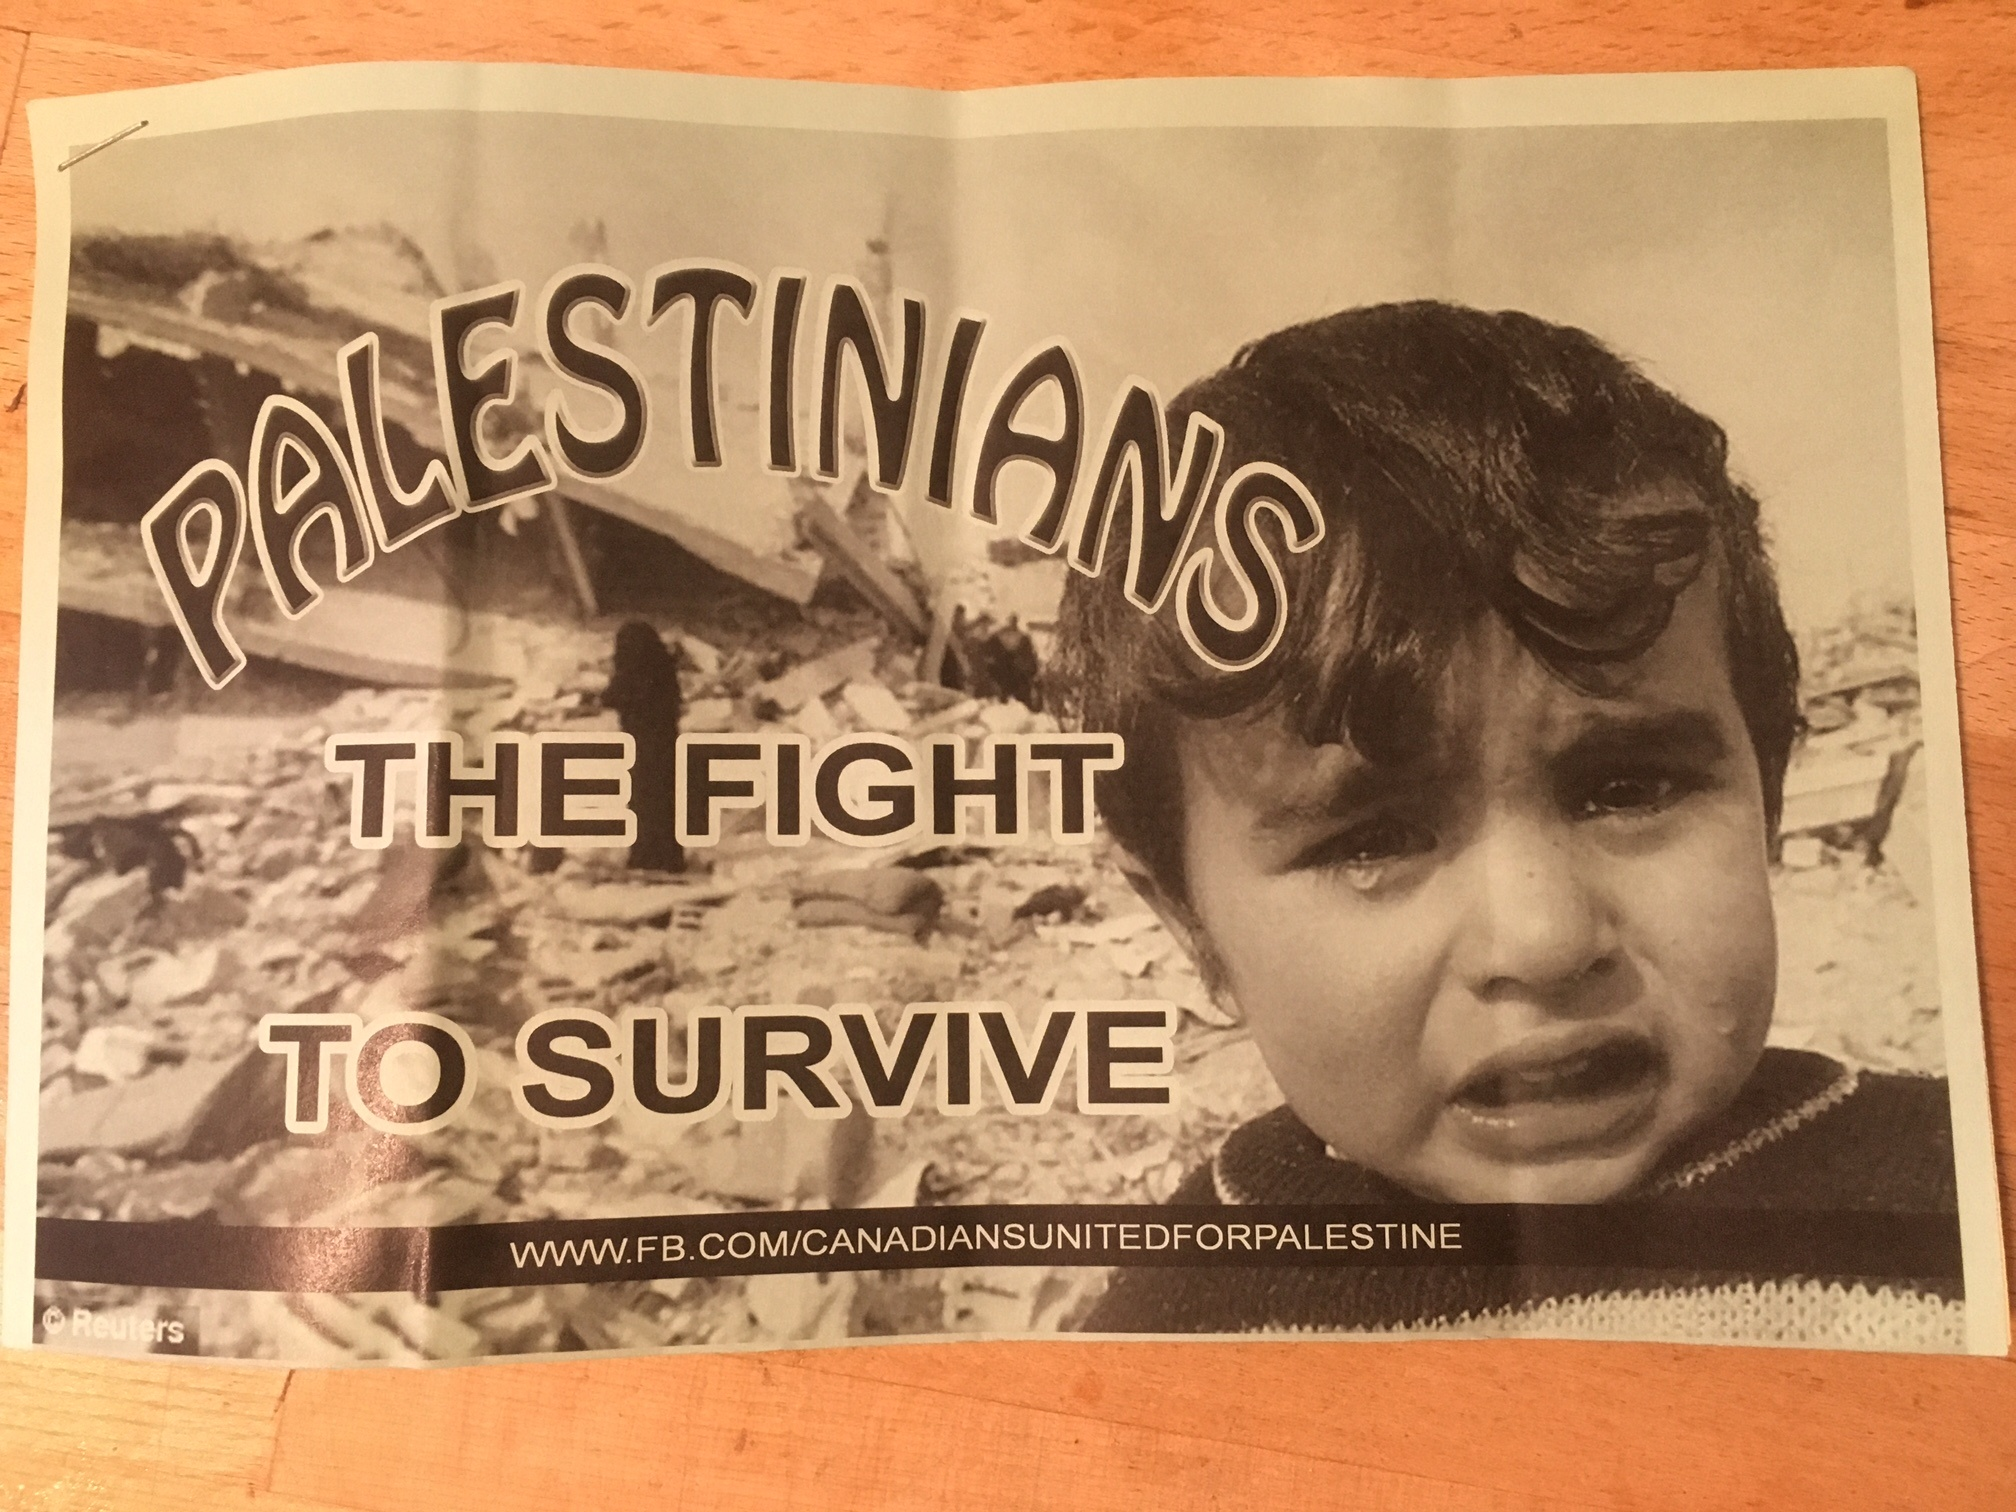 Free Palestine Flyer with Sad Child.JPG